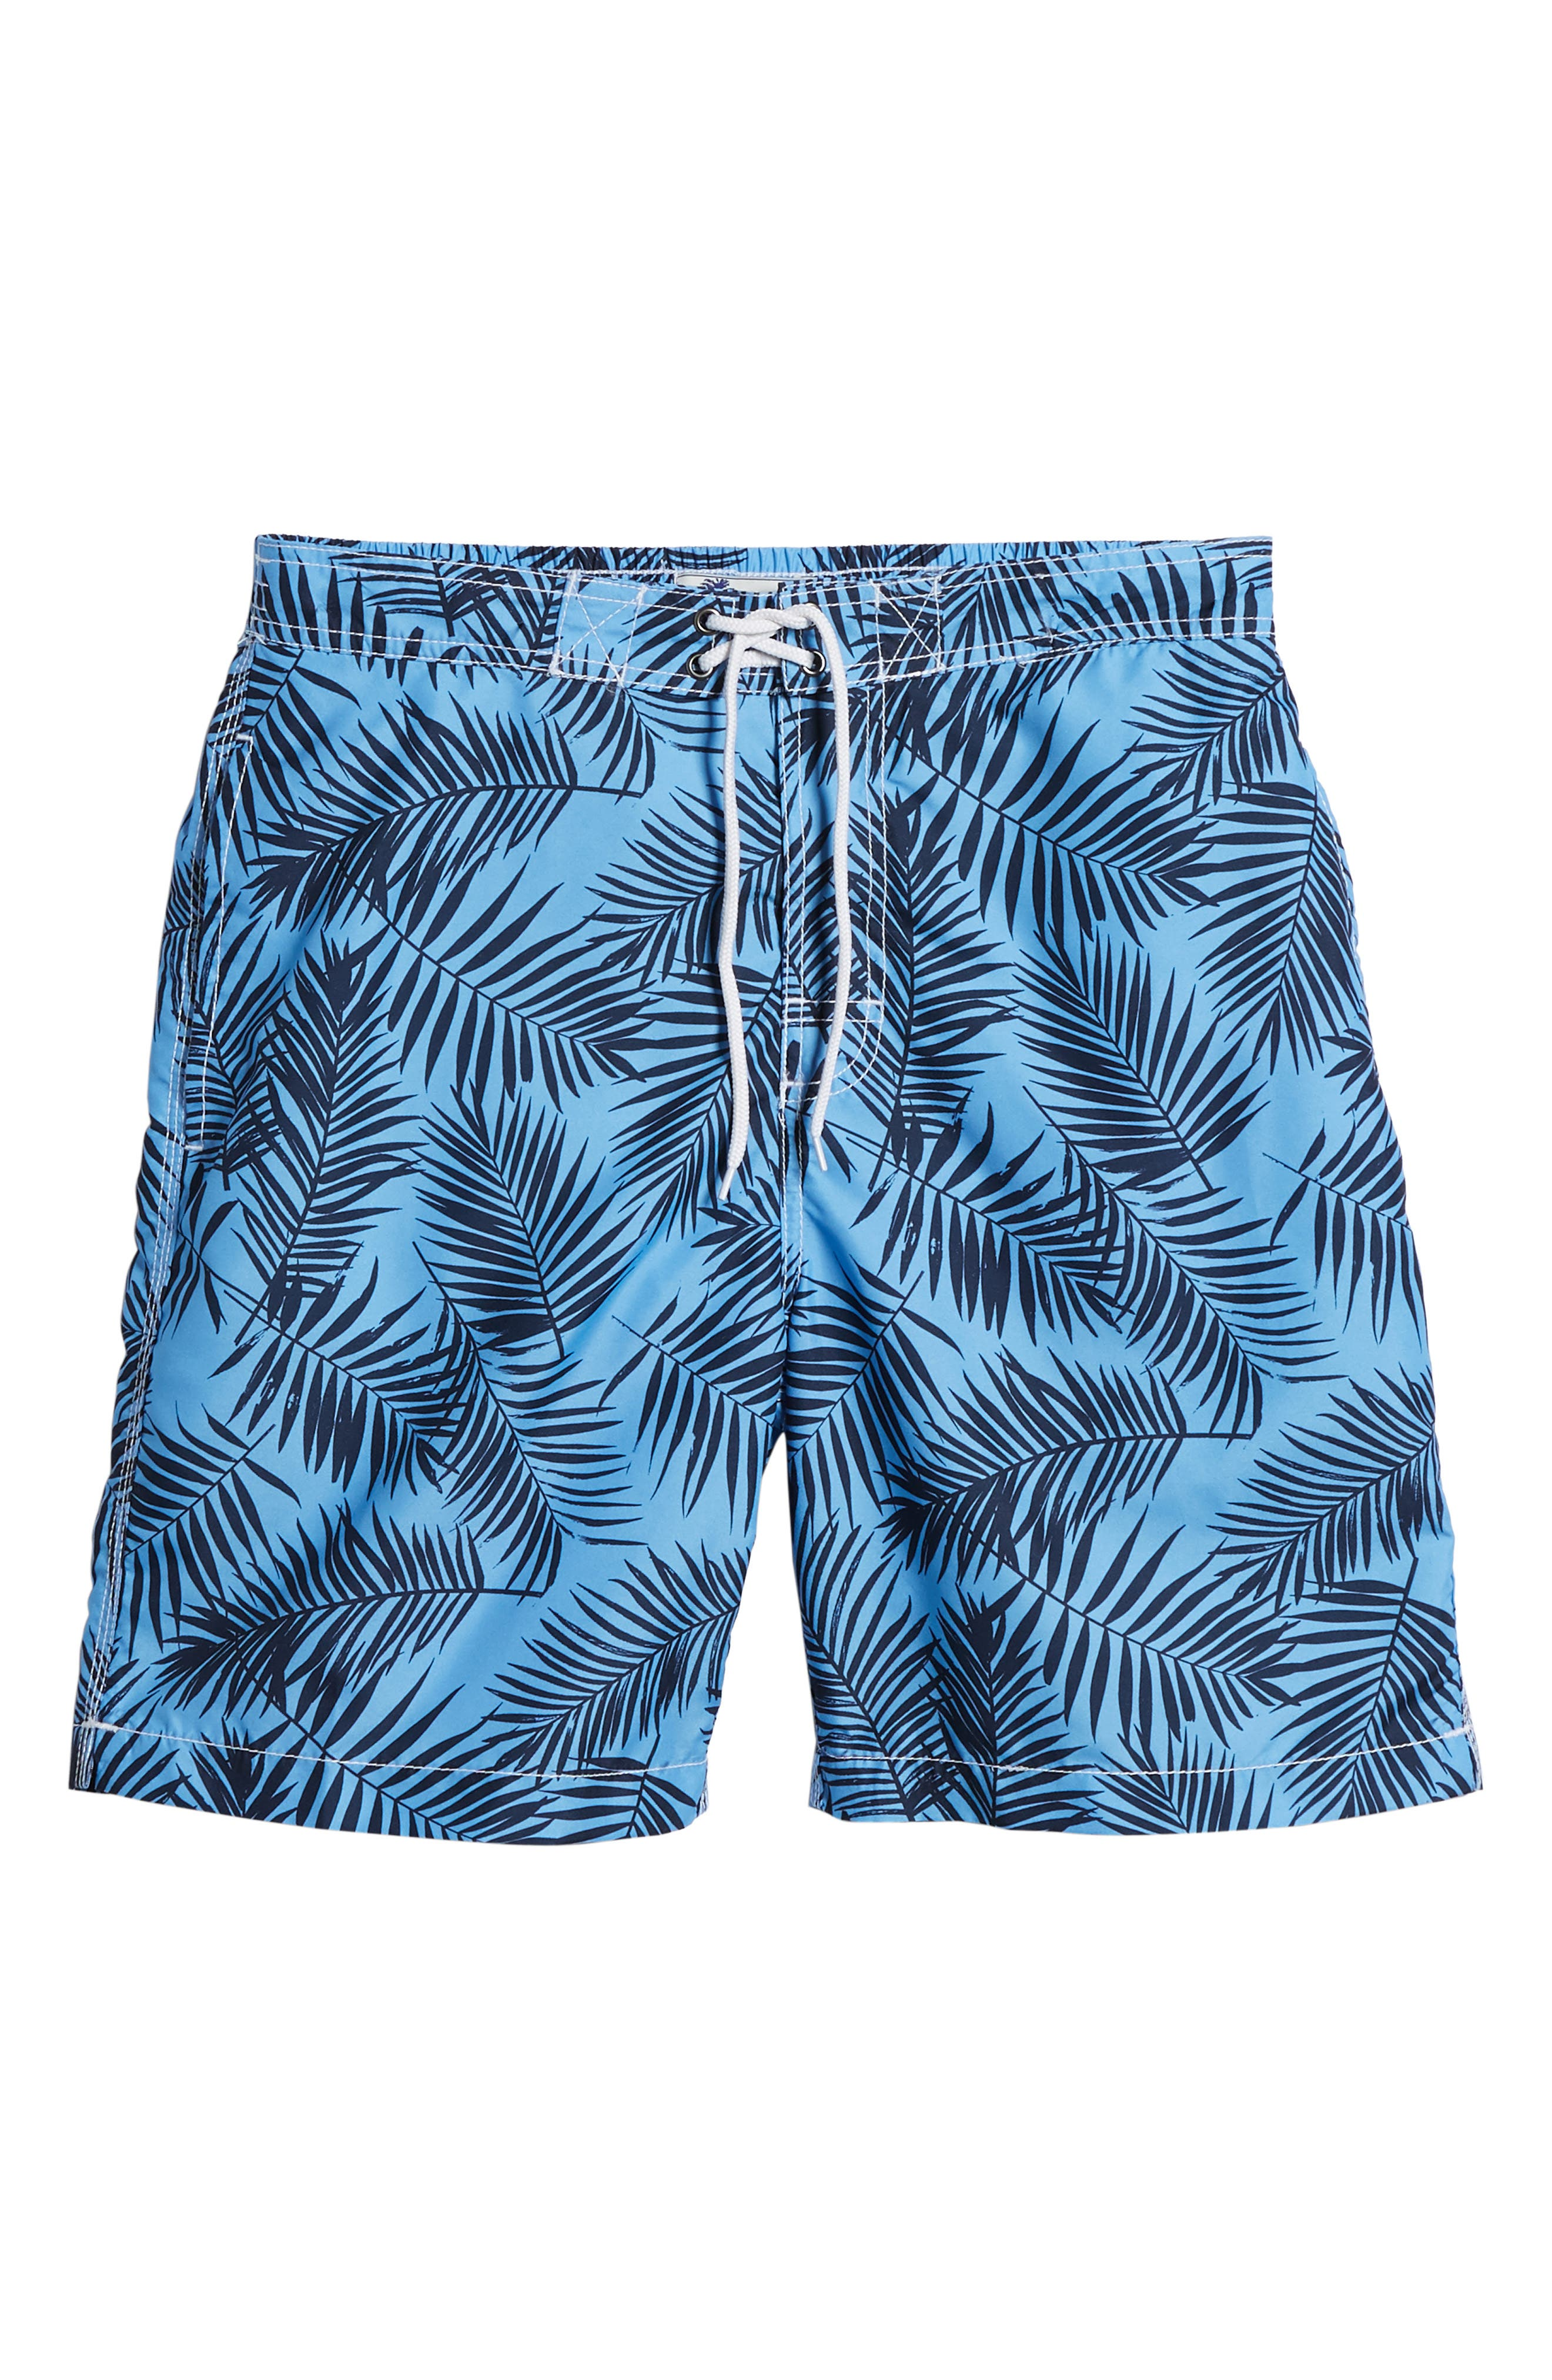 Swami Tropical Island Board Shorts,                             Alternate thumbnail 6, color,                             461